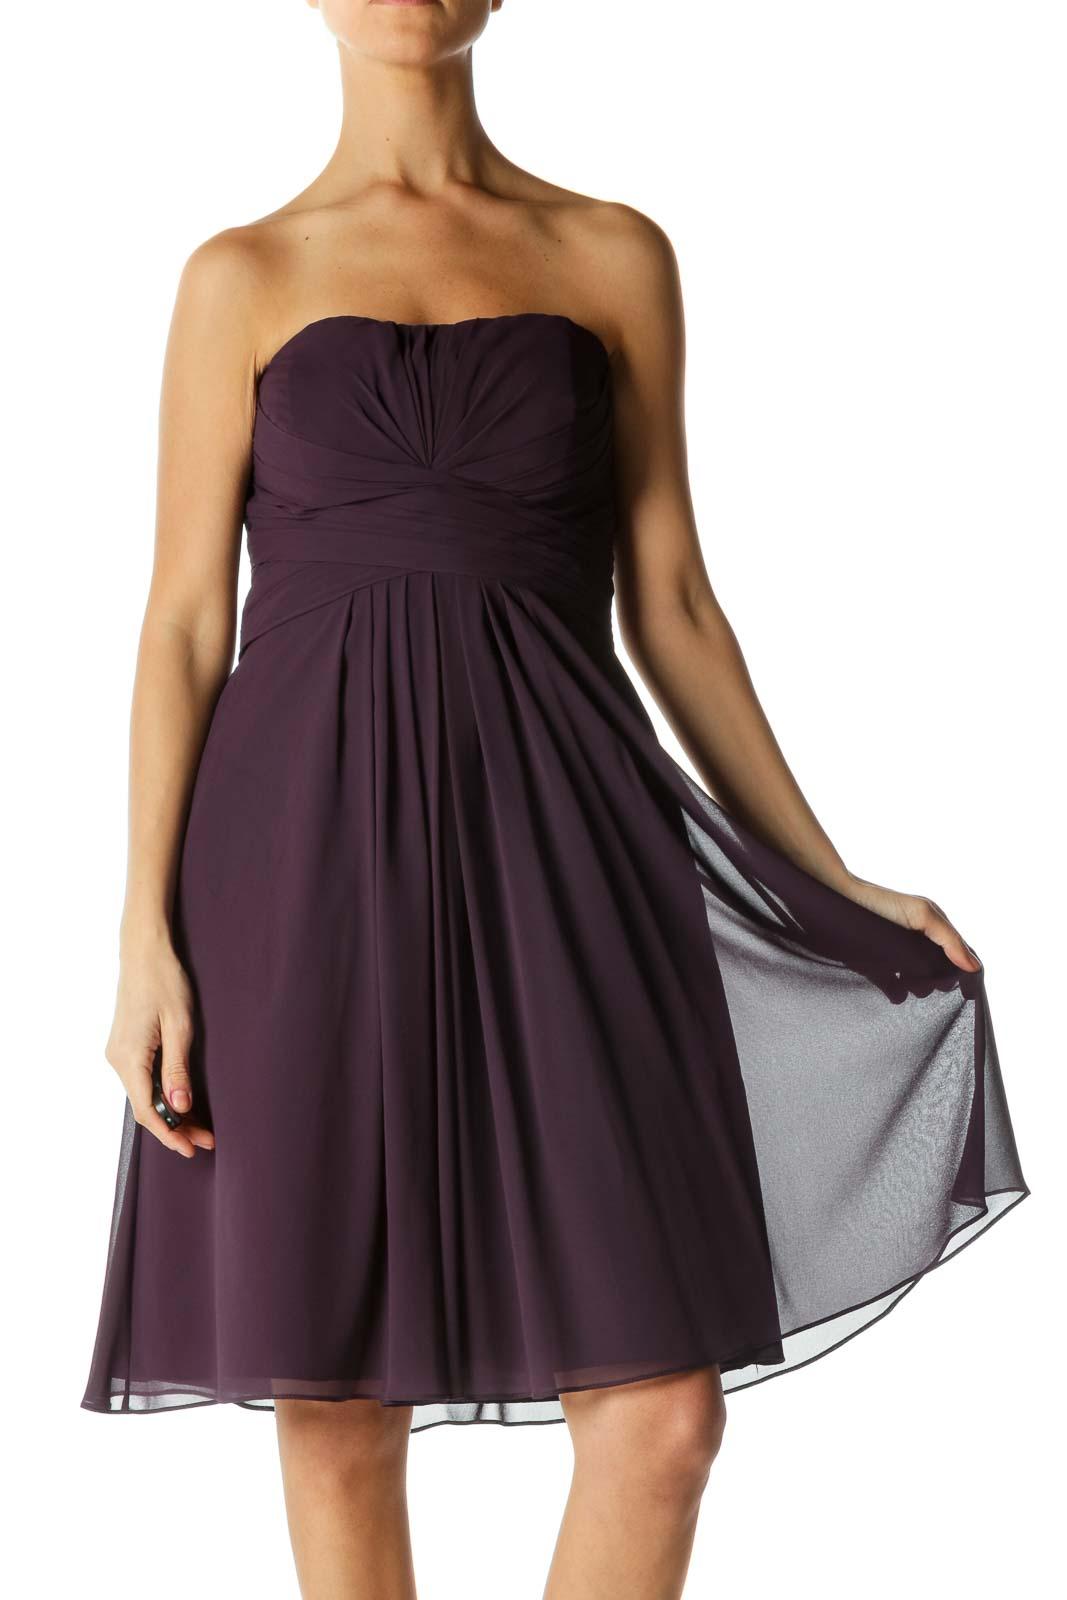 Purple Strapless Cocktail Dress Front